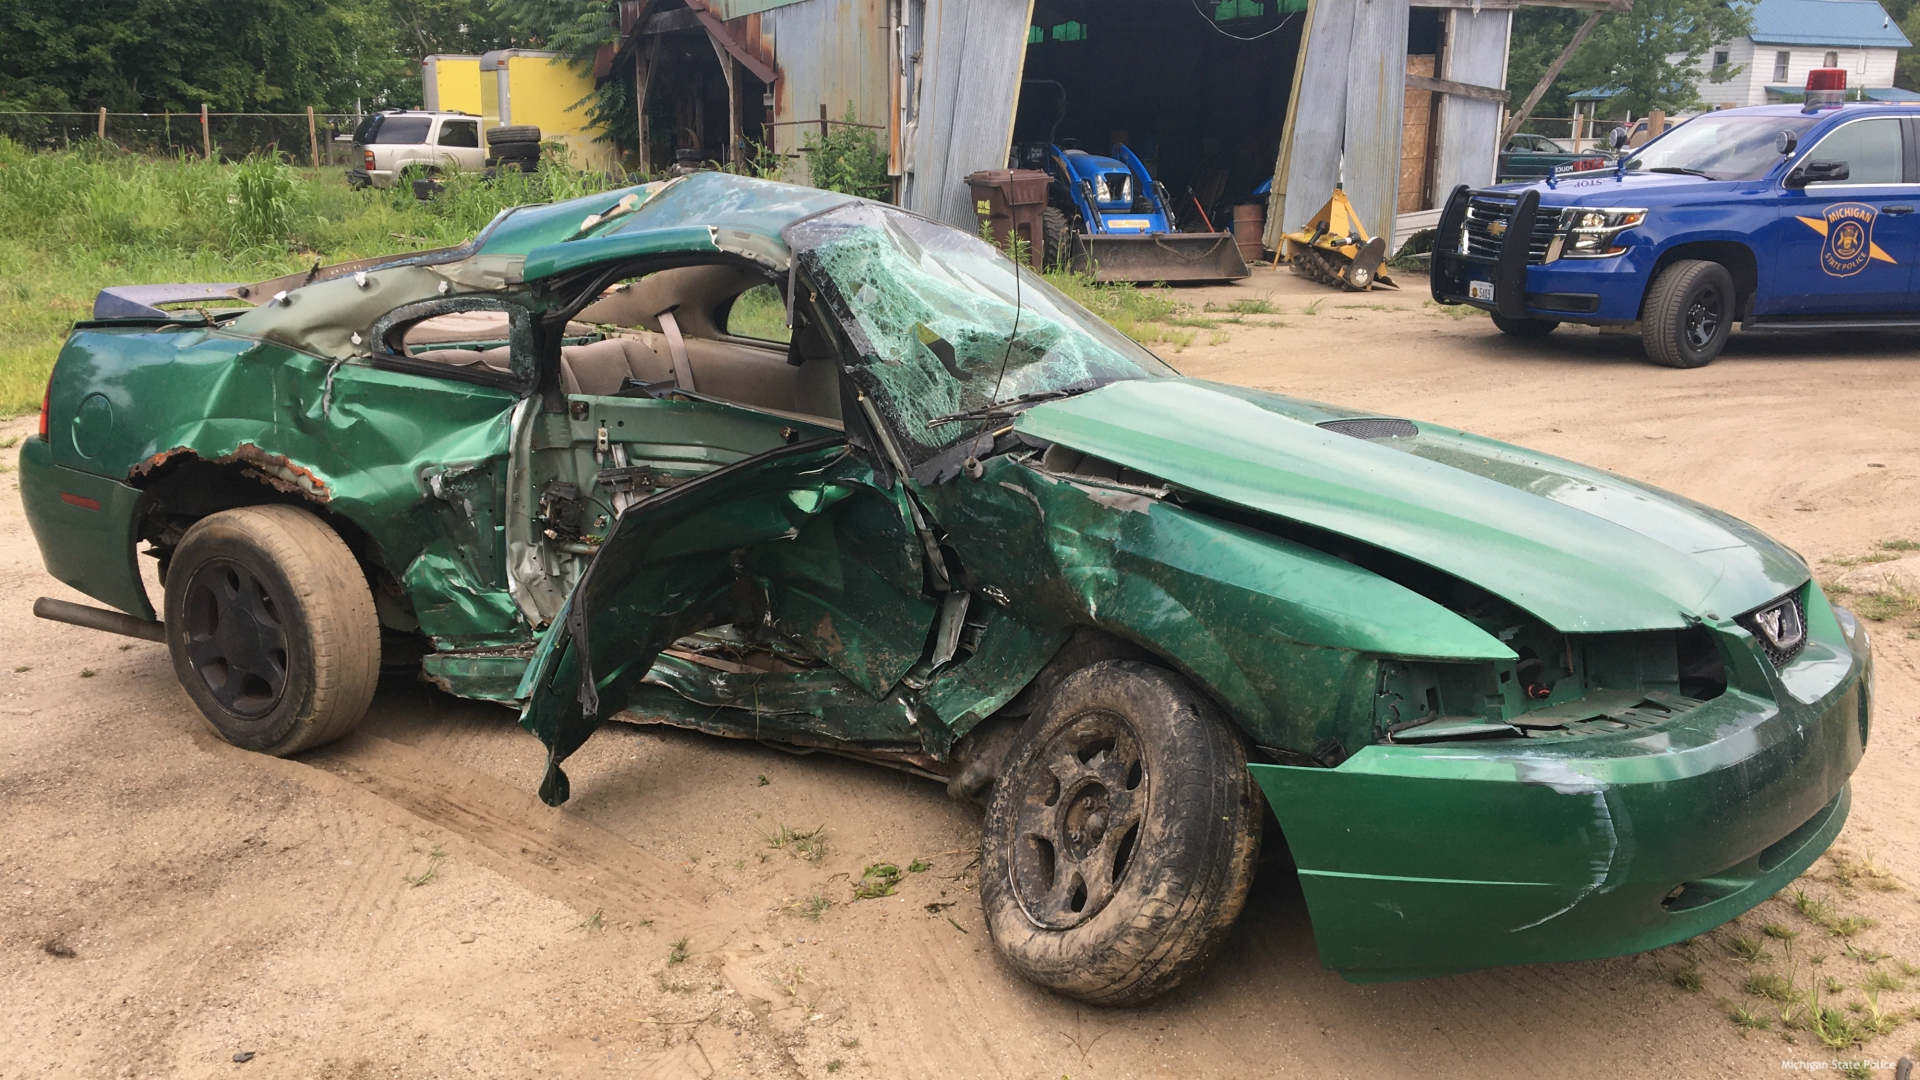 Sherman Township Christmas Service 2020 19 year old dies following St. Joseph County crash | WOODTV.com